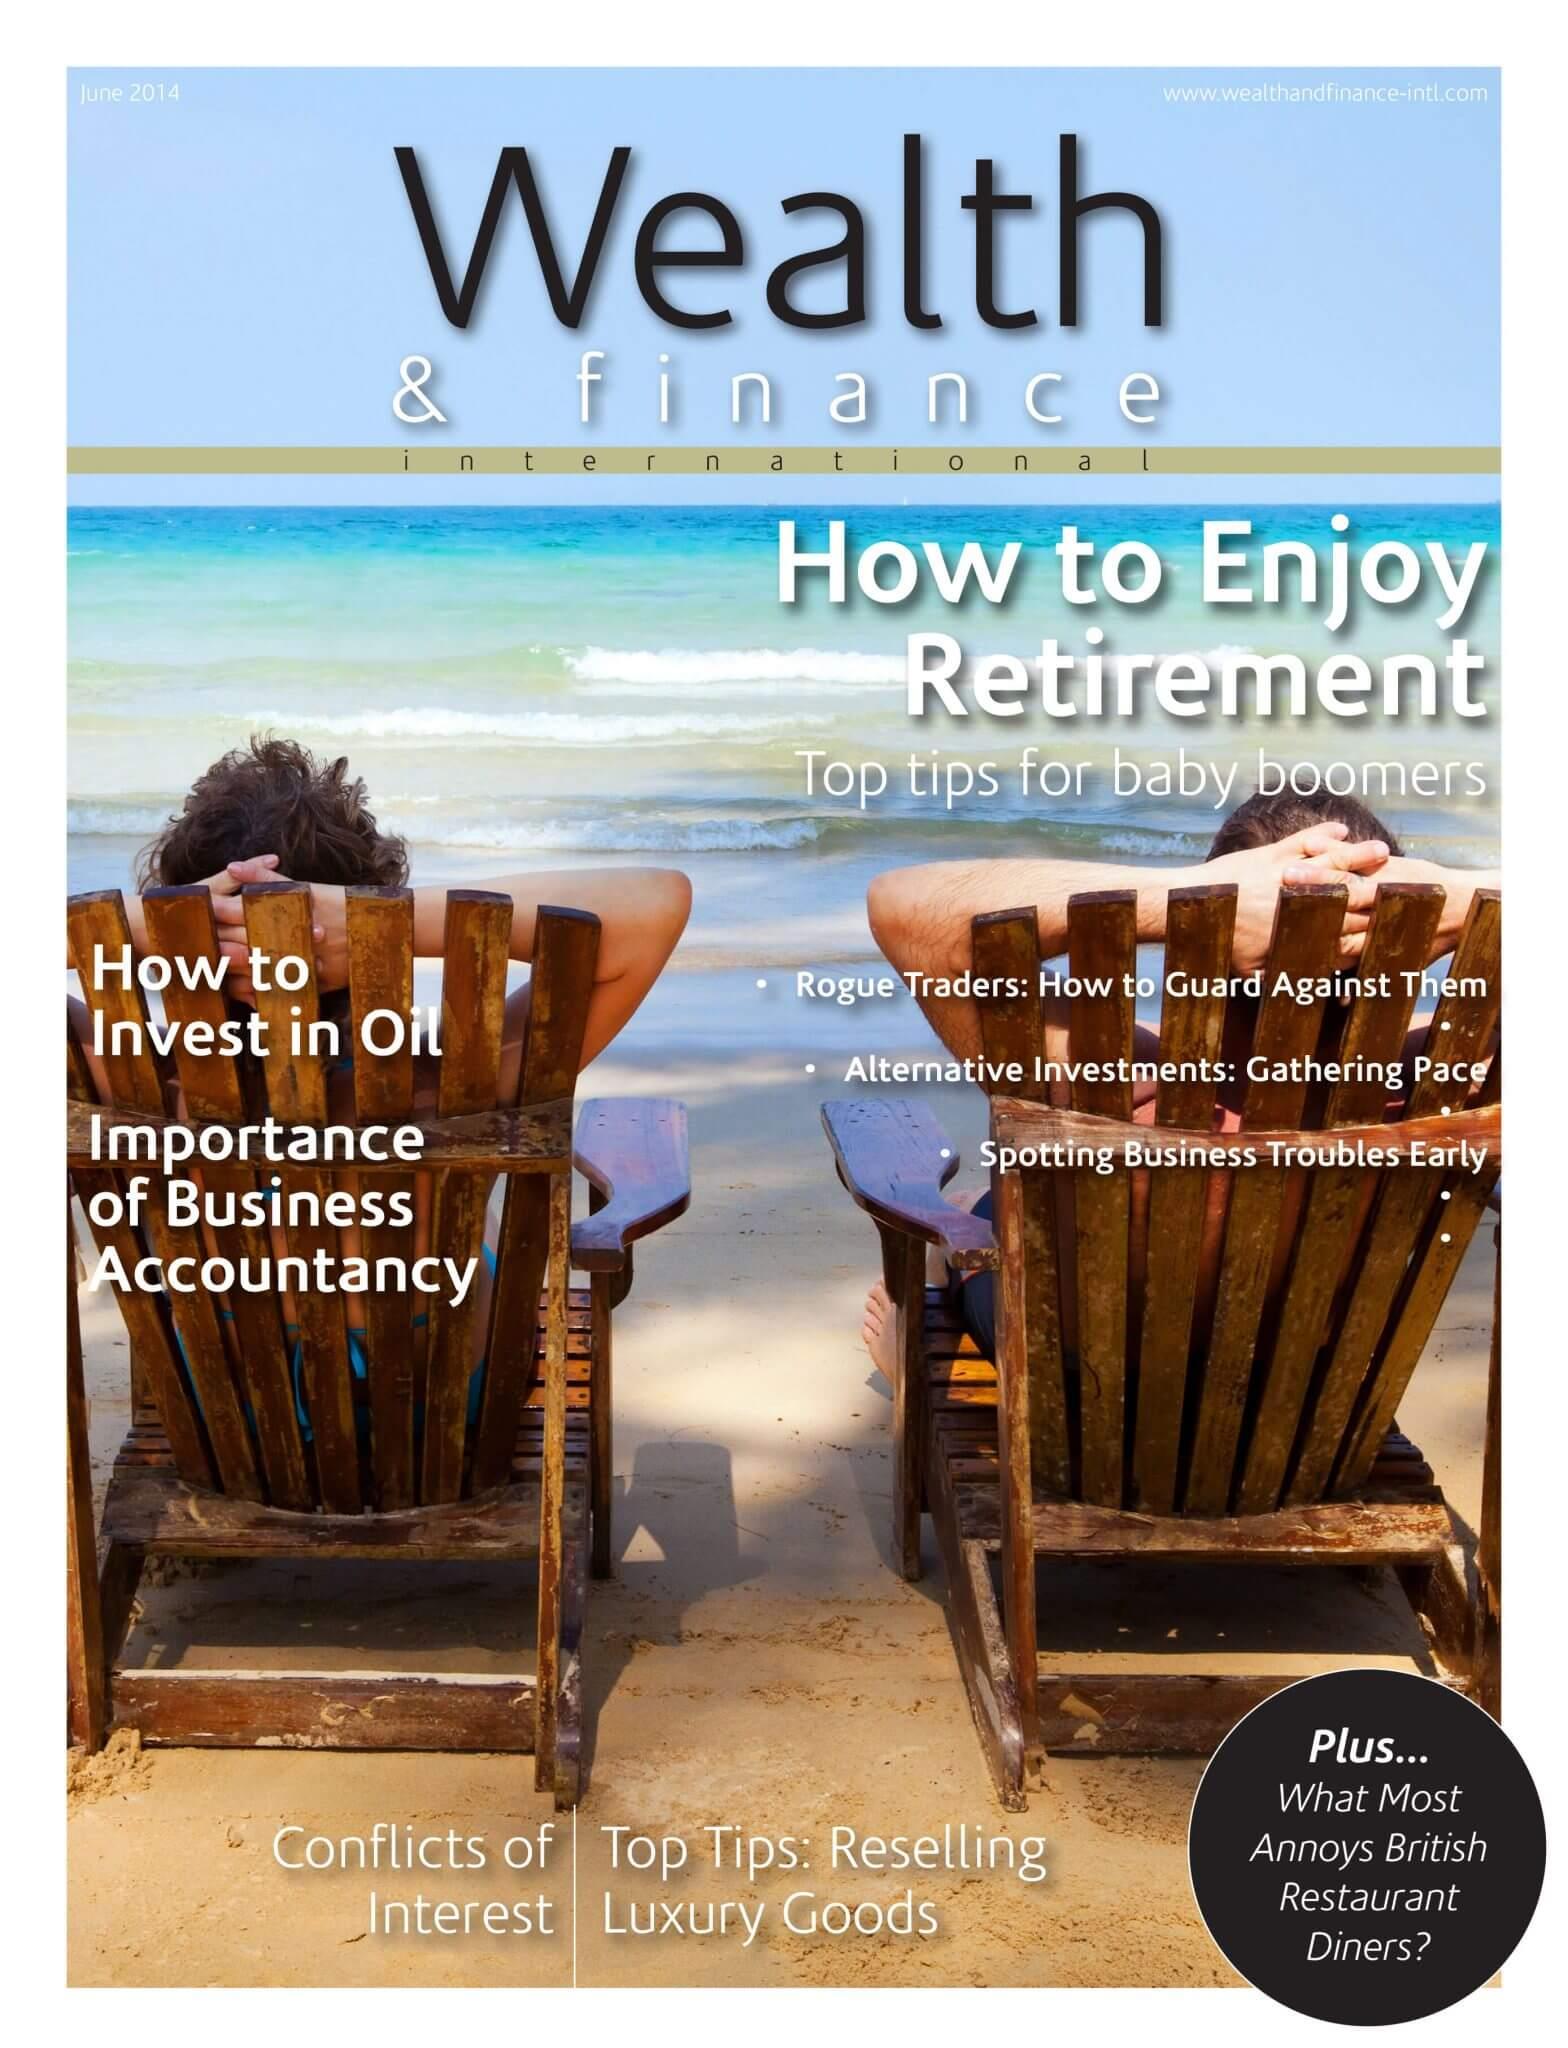 Wealth & Finance Magazine June 2014